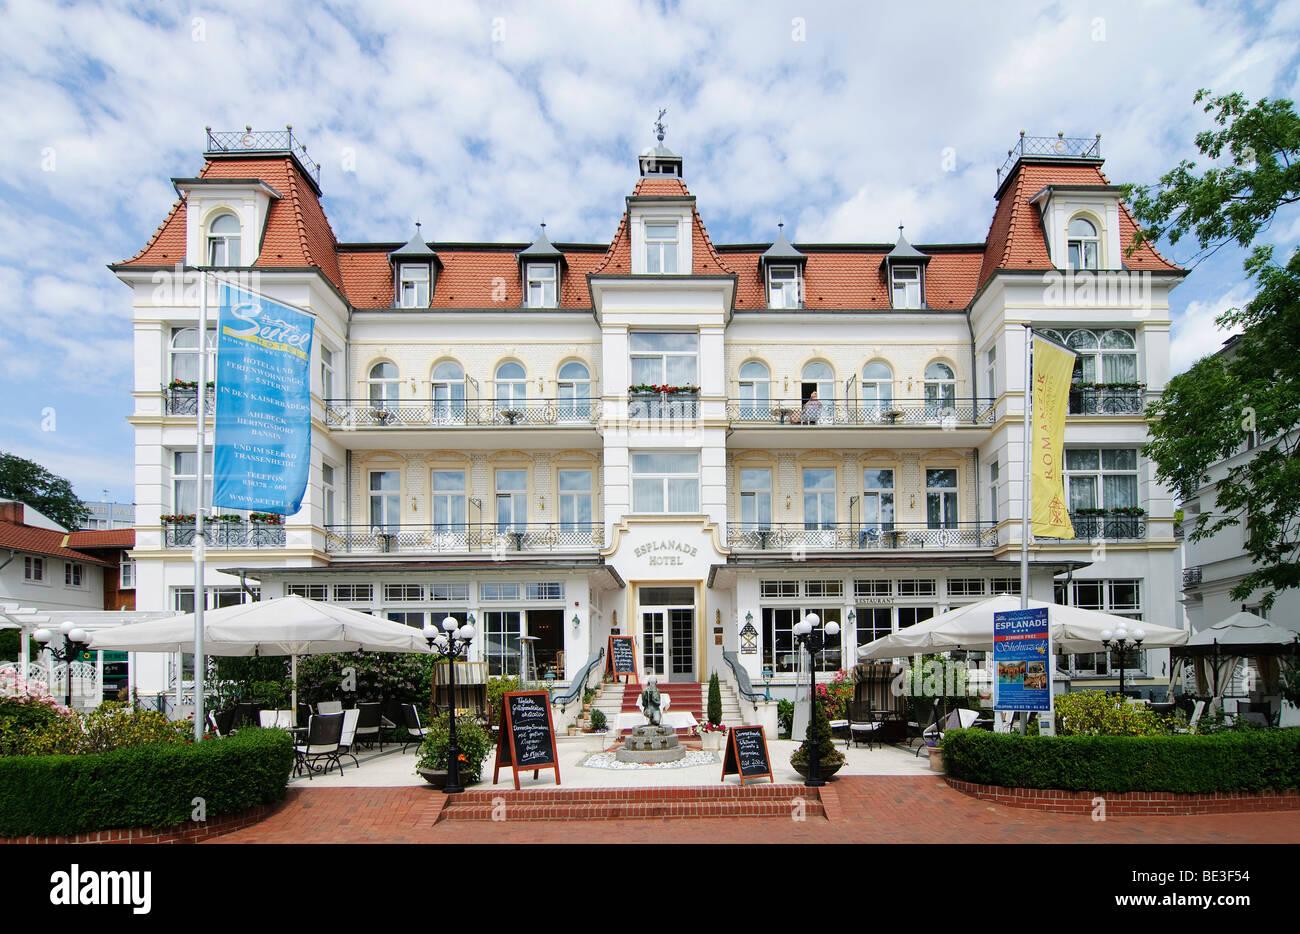 Romantik Hotel Esplanade, Spa-Stil-Architektur, Seebad Heringsdorf, Insel Usedom, Mecklenburg-Vorpommern, Deutschland Stockbild